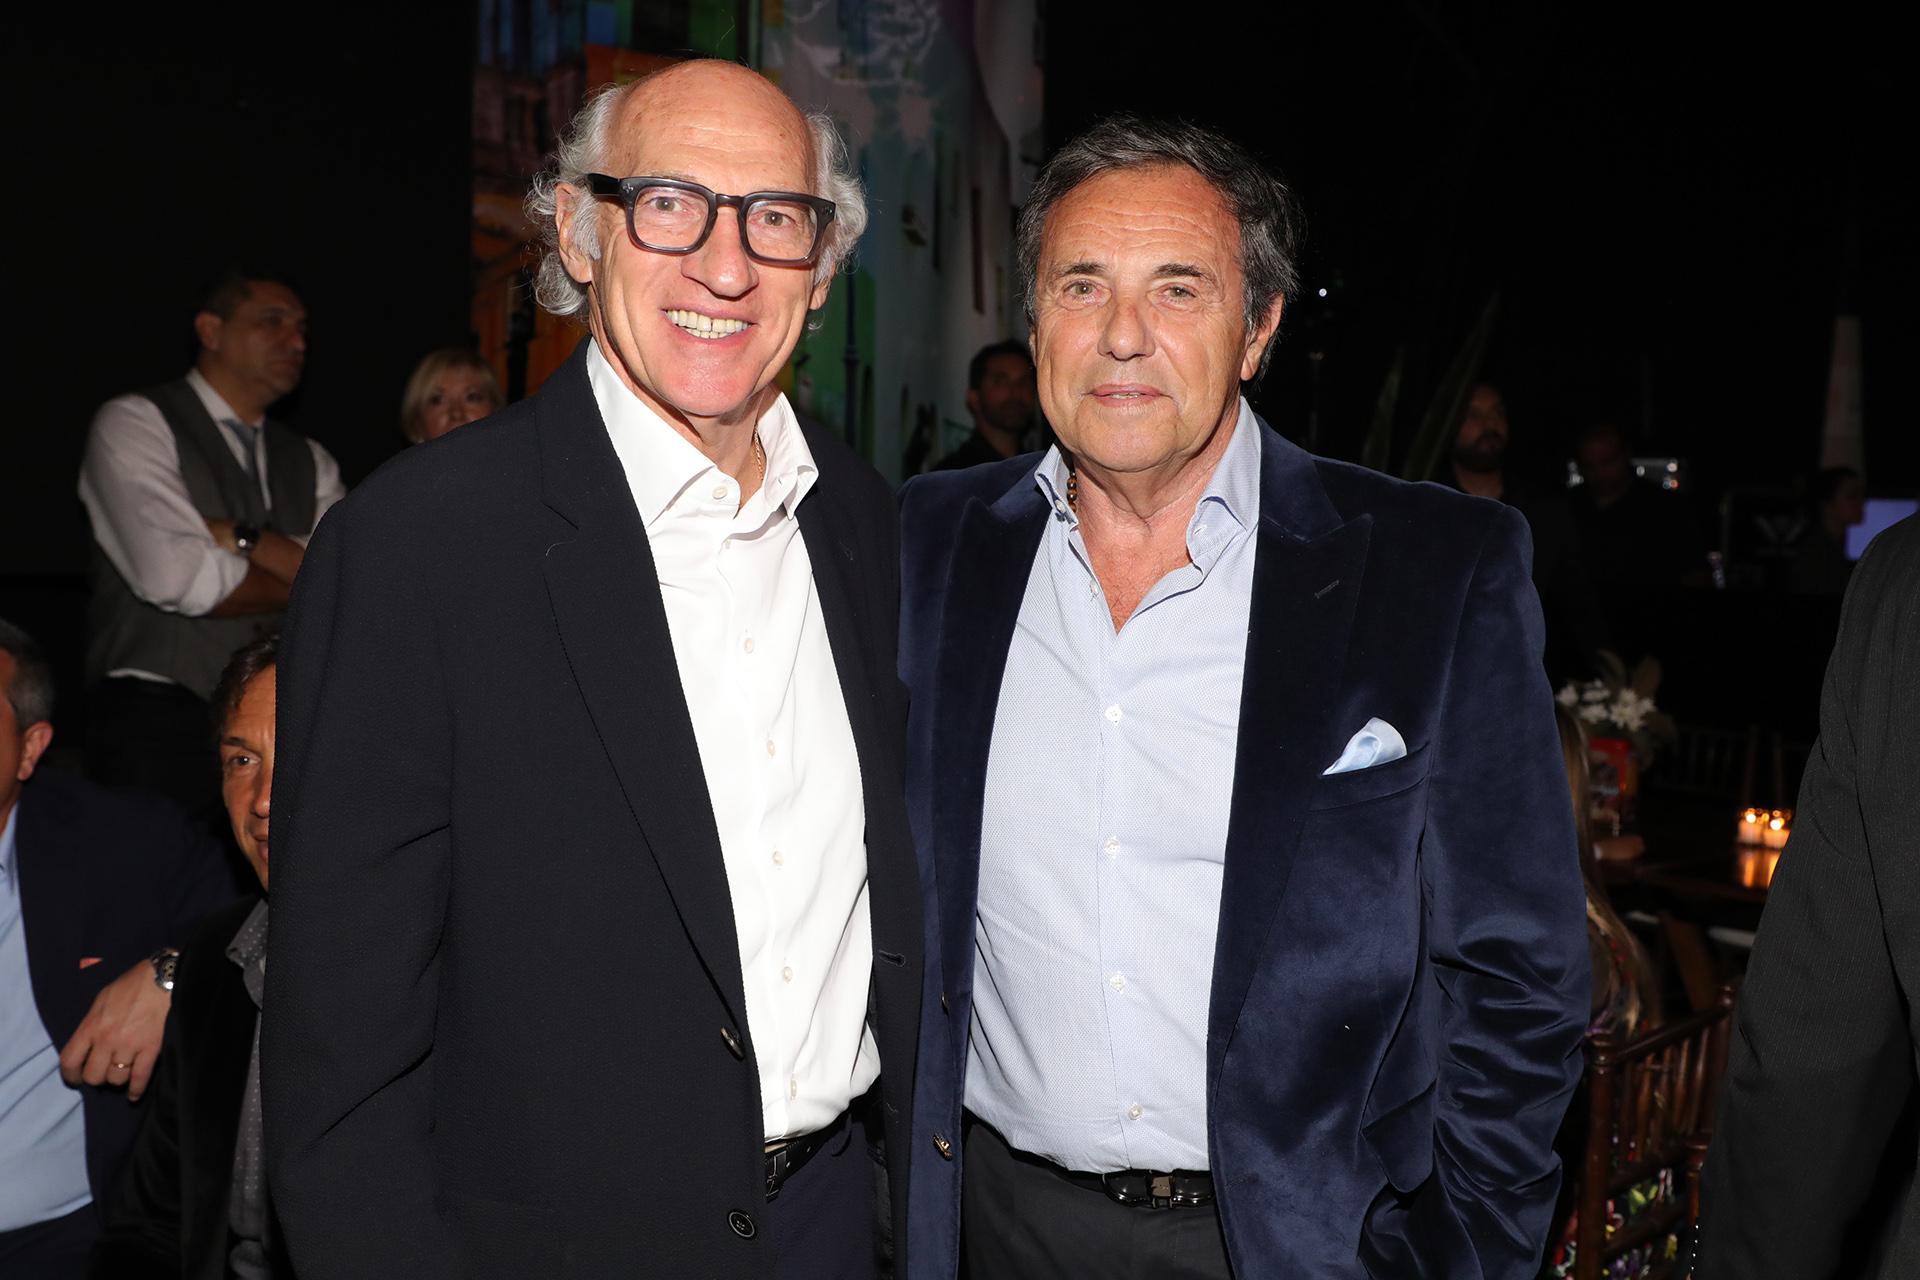 Carlos Bianchi y Jorge Sánchez Cordova